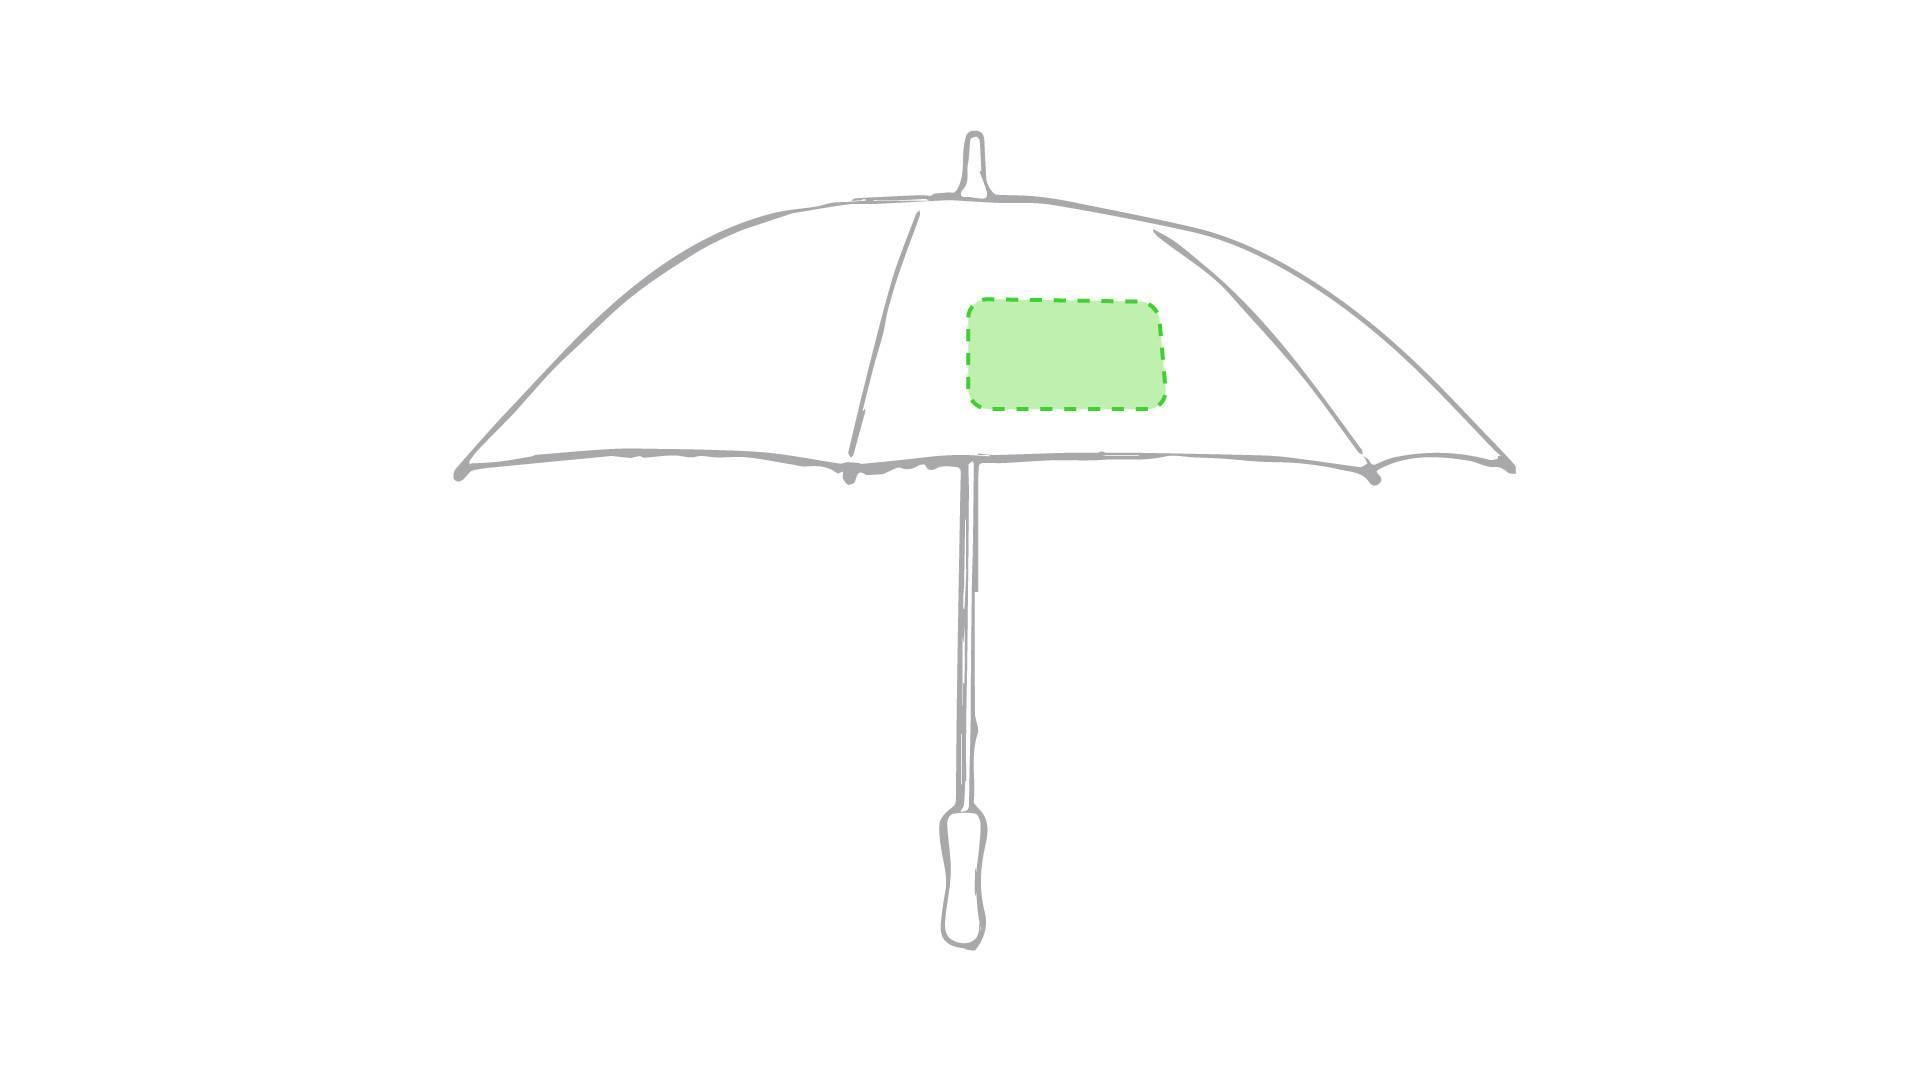 Paraguas con funda 1